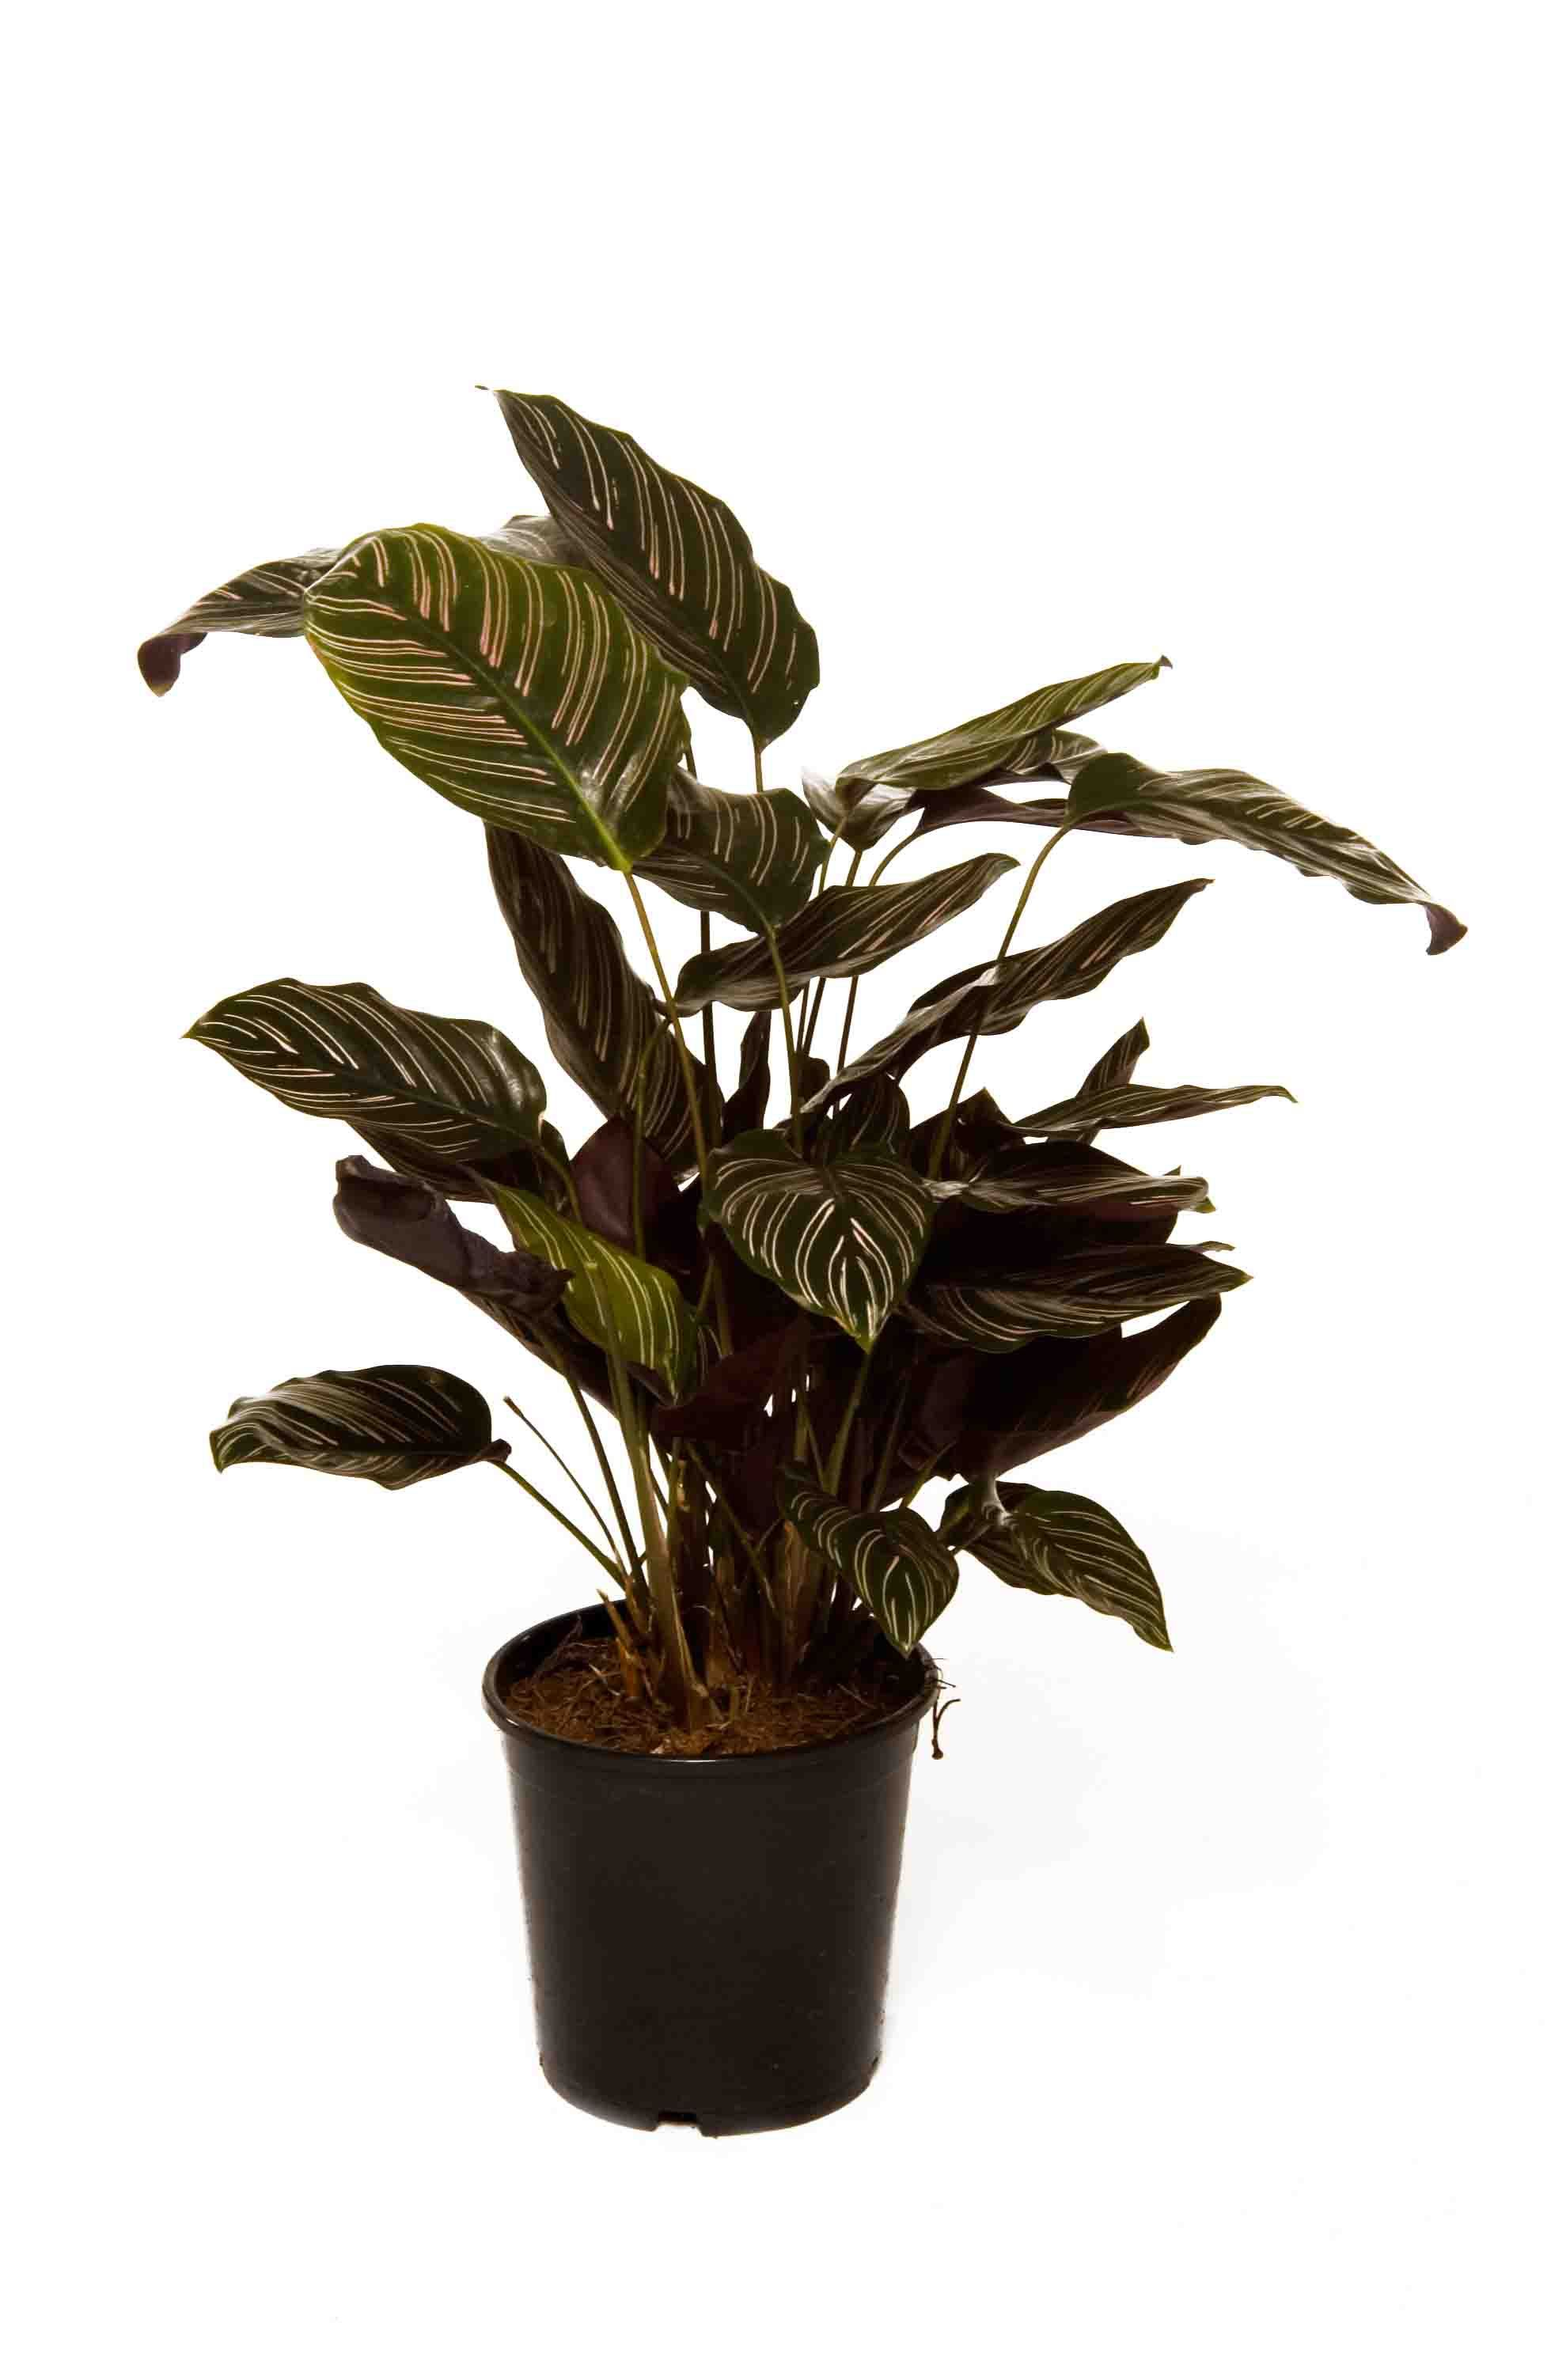 Calathea Ornata Like A Peace Lily But Tougher And No Flowers But